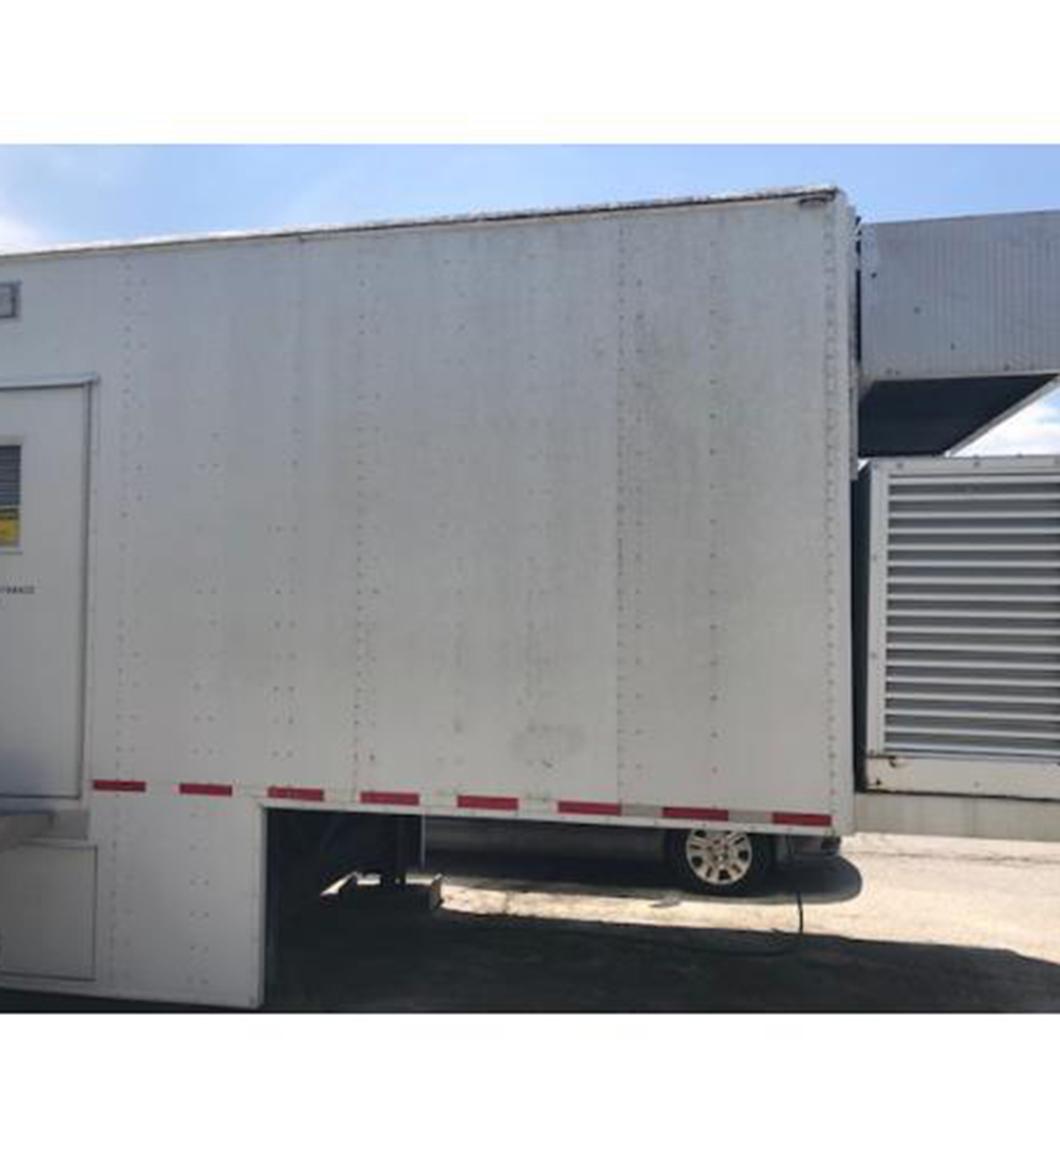 2004 GE 1.5T LX EchoSpeed 9x 4 Channel Mobile MRI